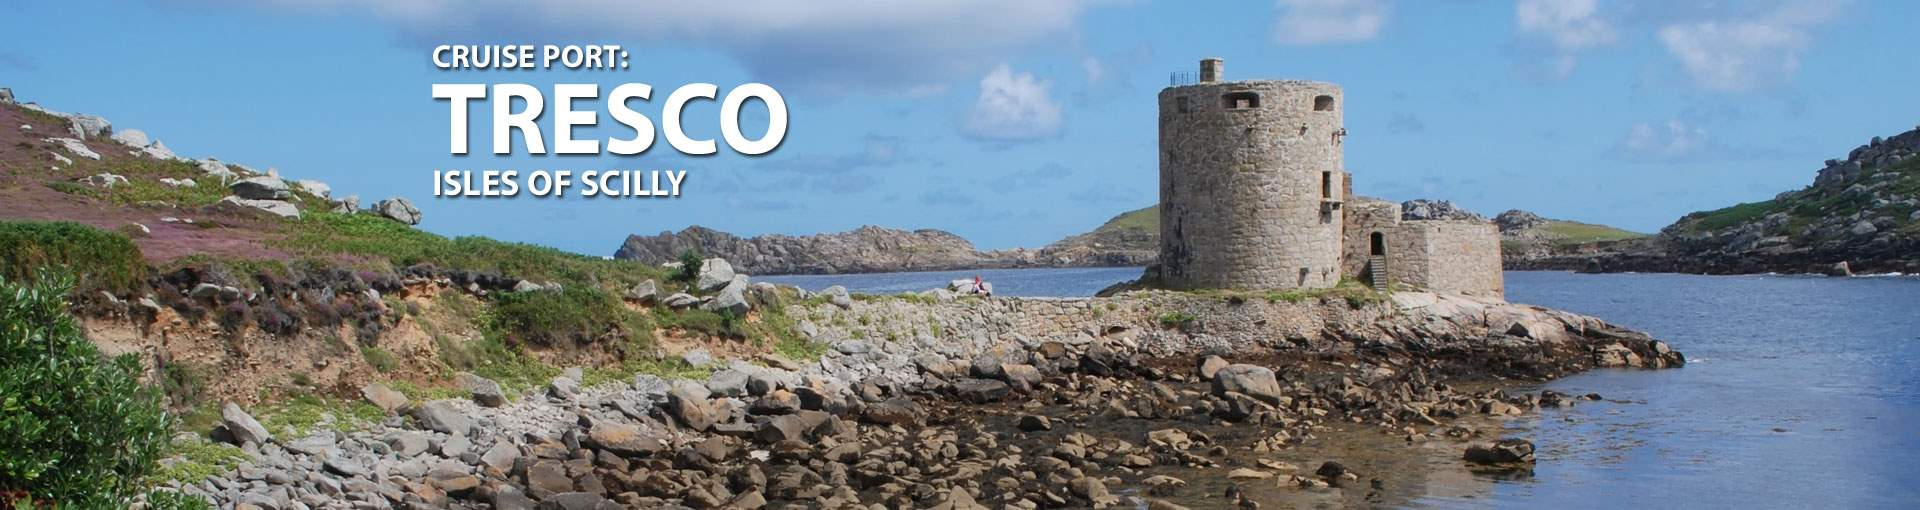 Cruises to Tresco, Isles Of Scilly